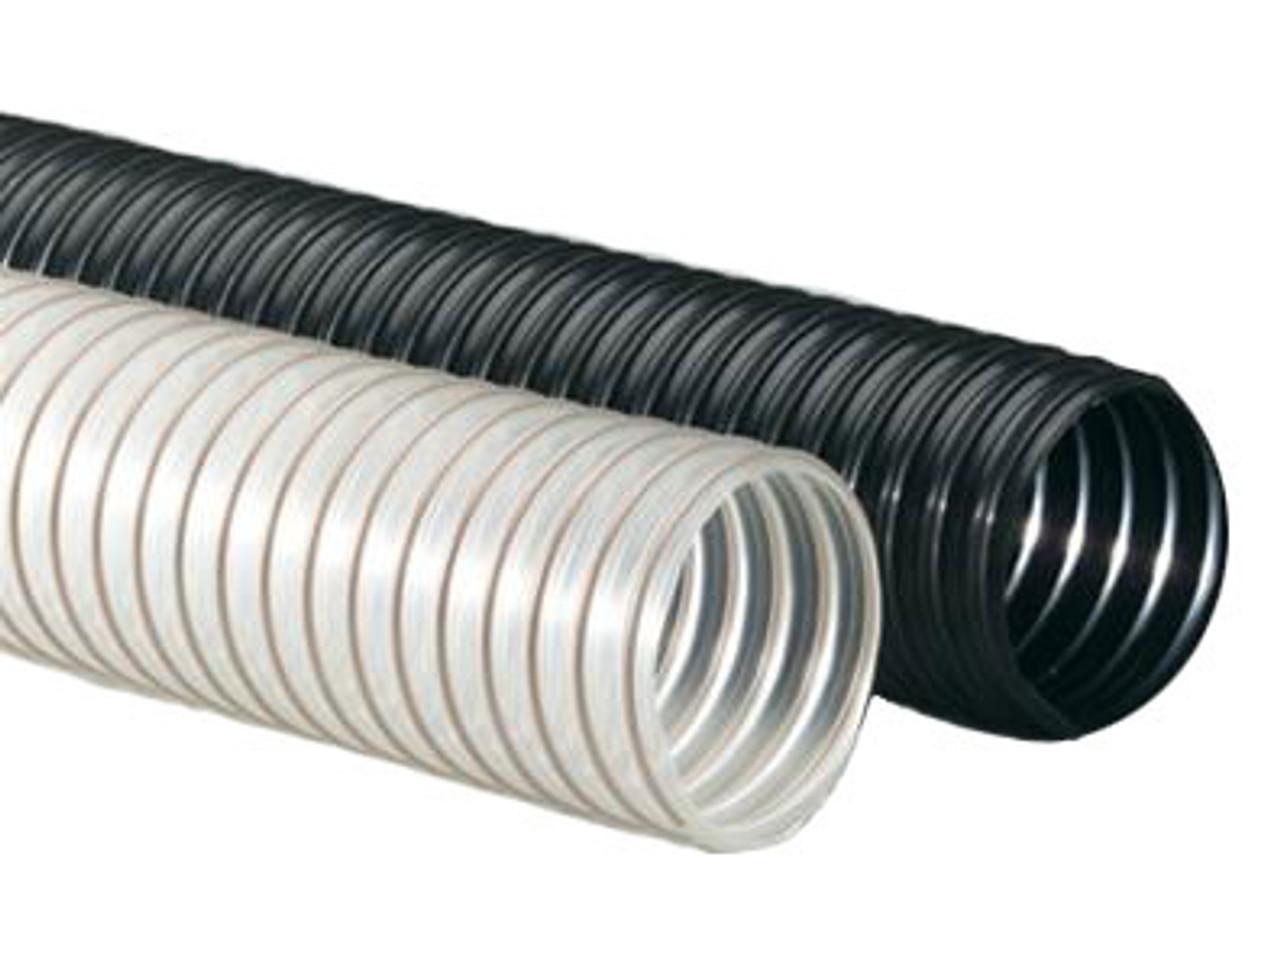 "Flexadux PV R-3 4/"" x 25/' PVC Hose Clear Flexible Food Grade Hose"